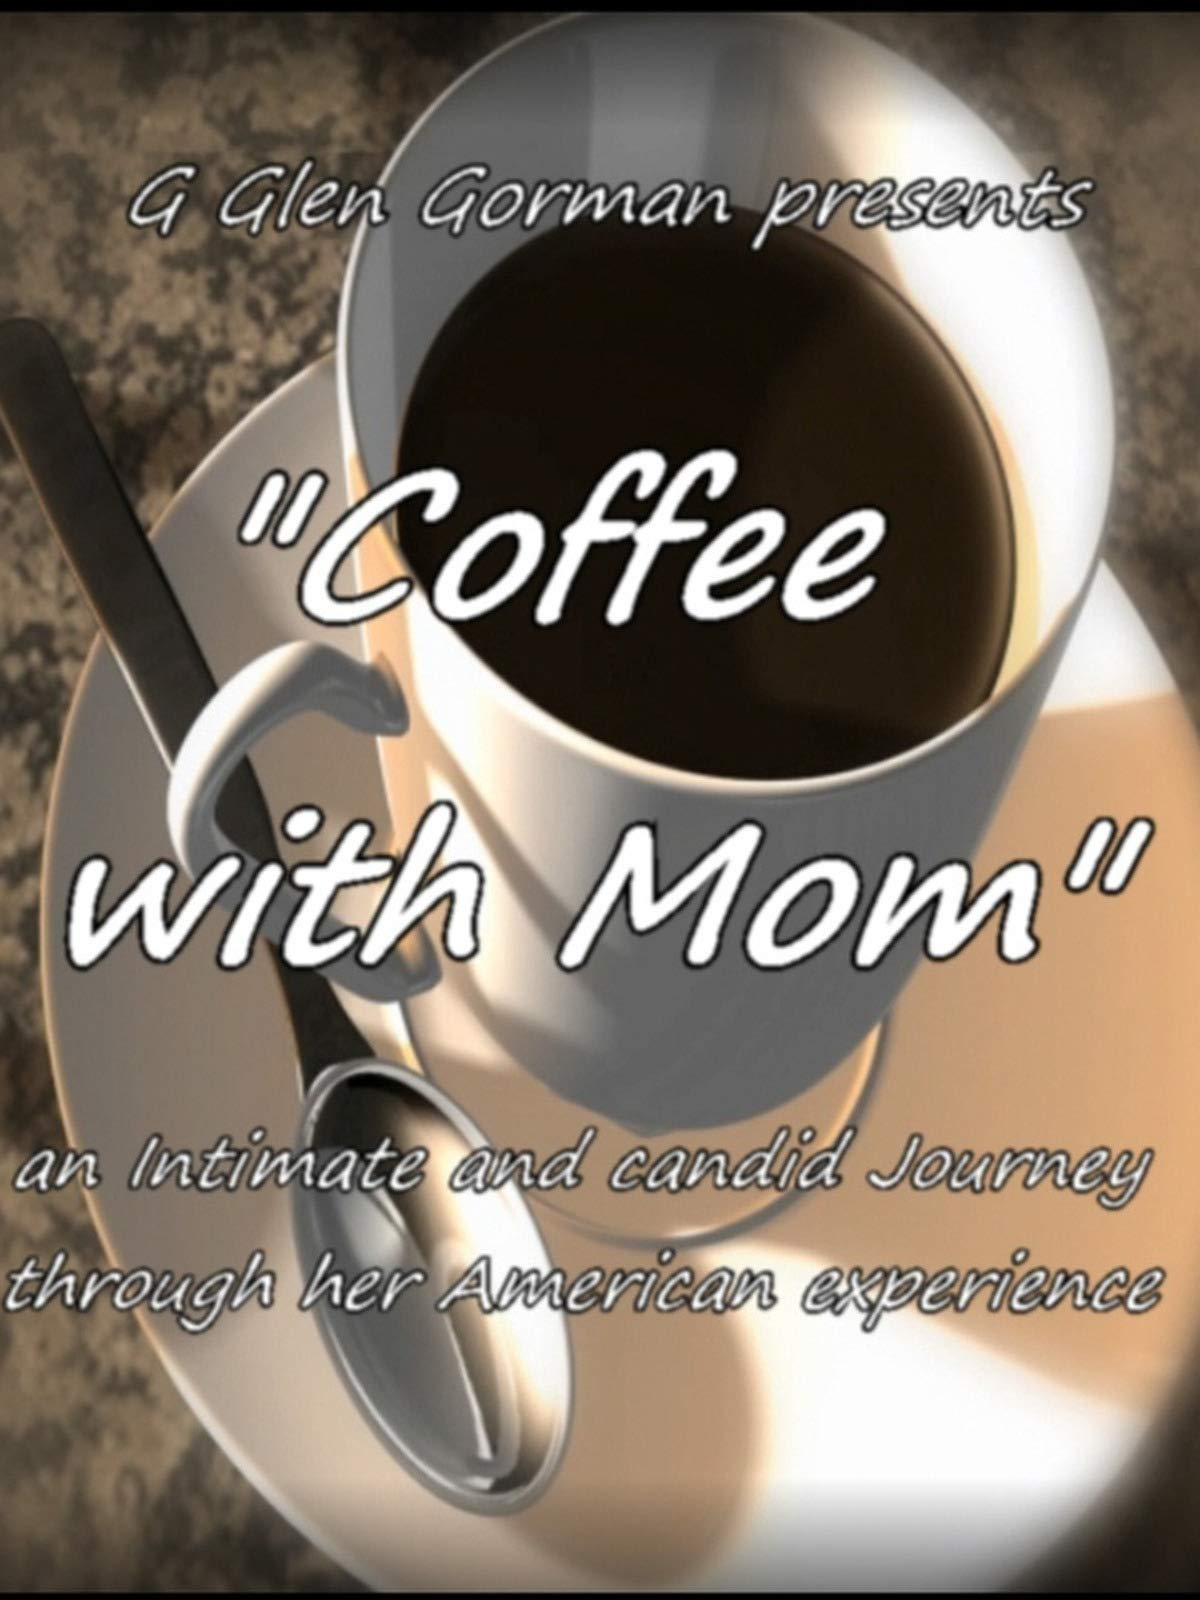 "G Glen Gorman presents ""Coffee with Mom"""